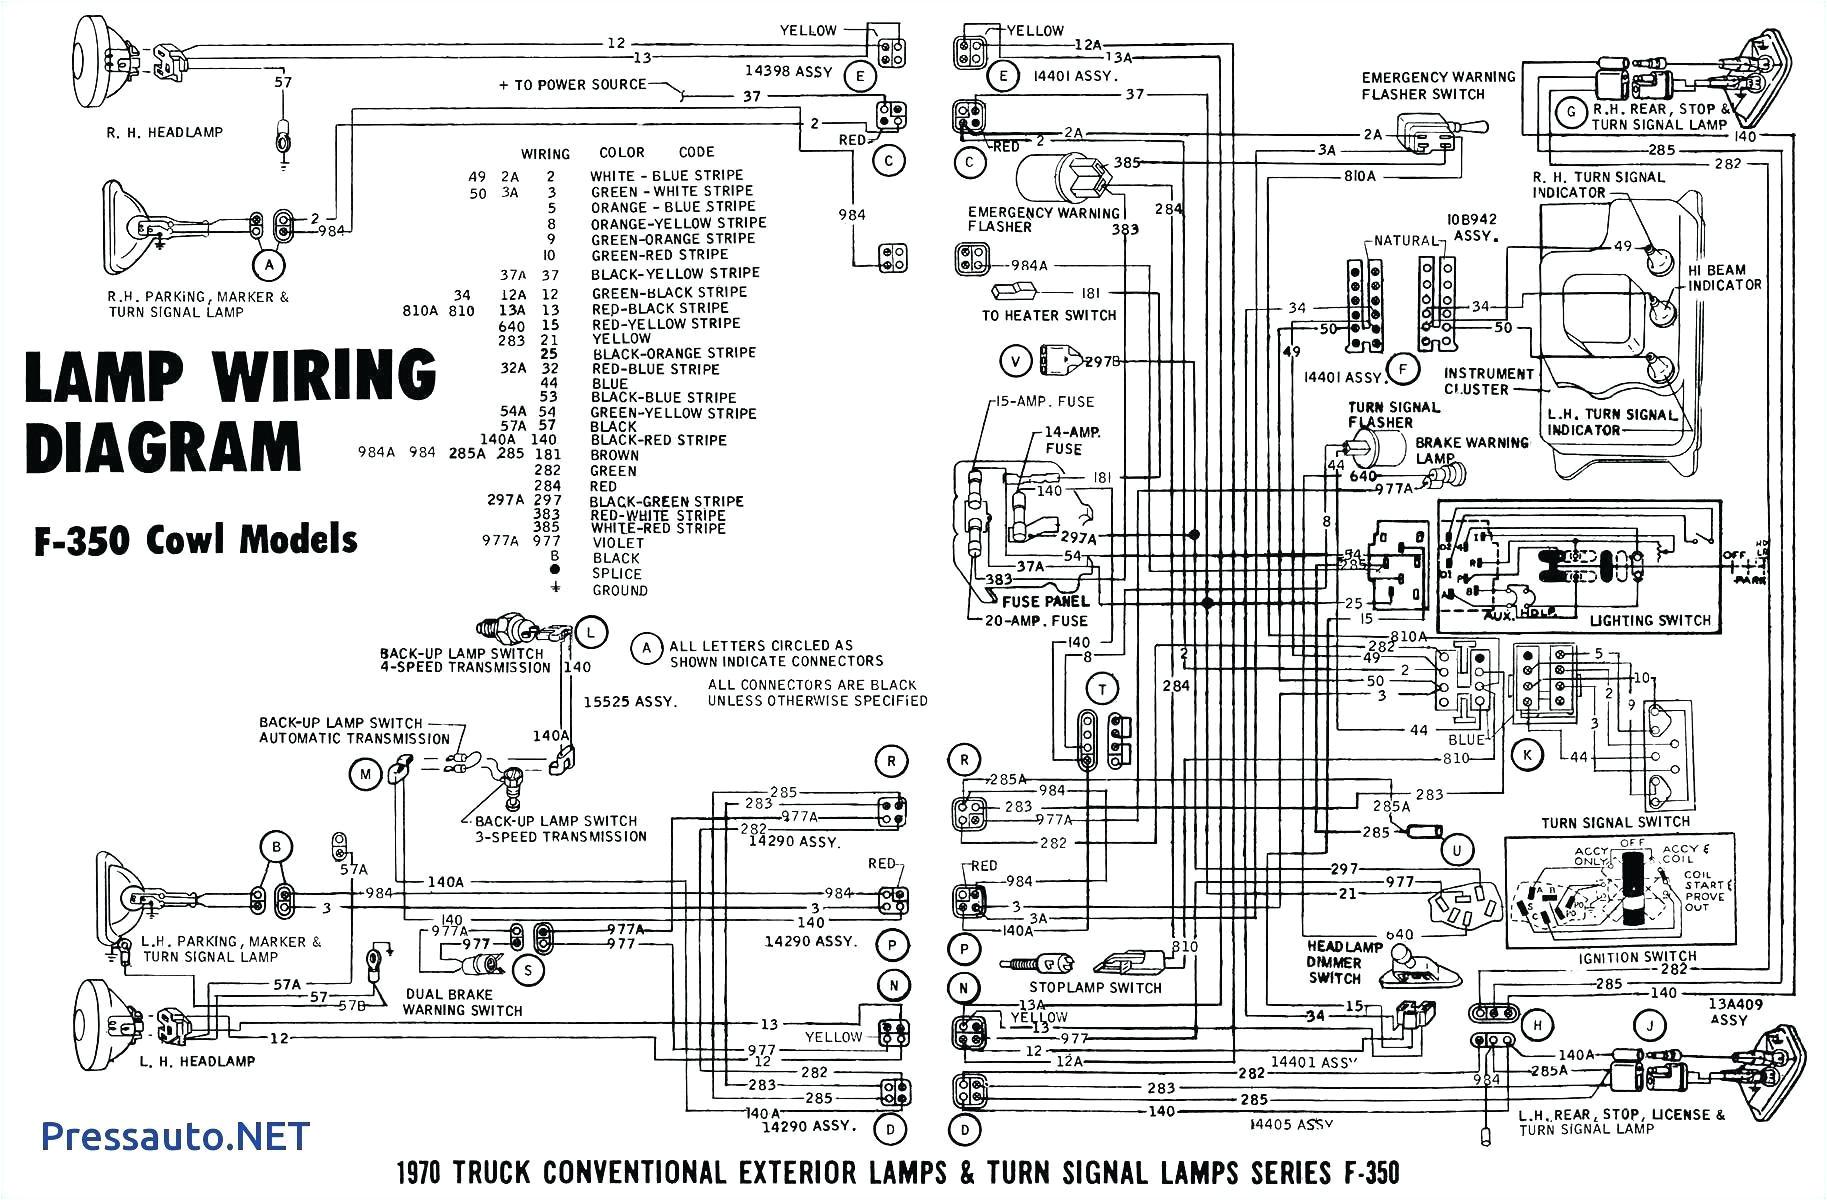 heat pump thermostat wiring diagram rheem heat pump thermostat wiring diagram air handler slim great and of heat pump thermostat wiring diagram jpg